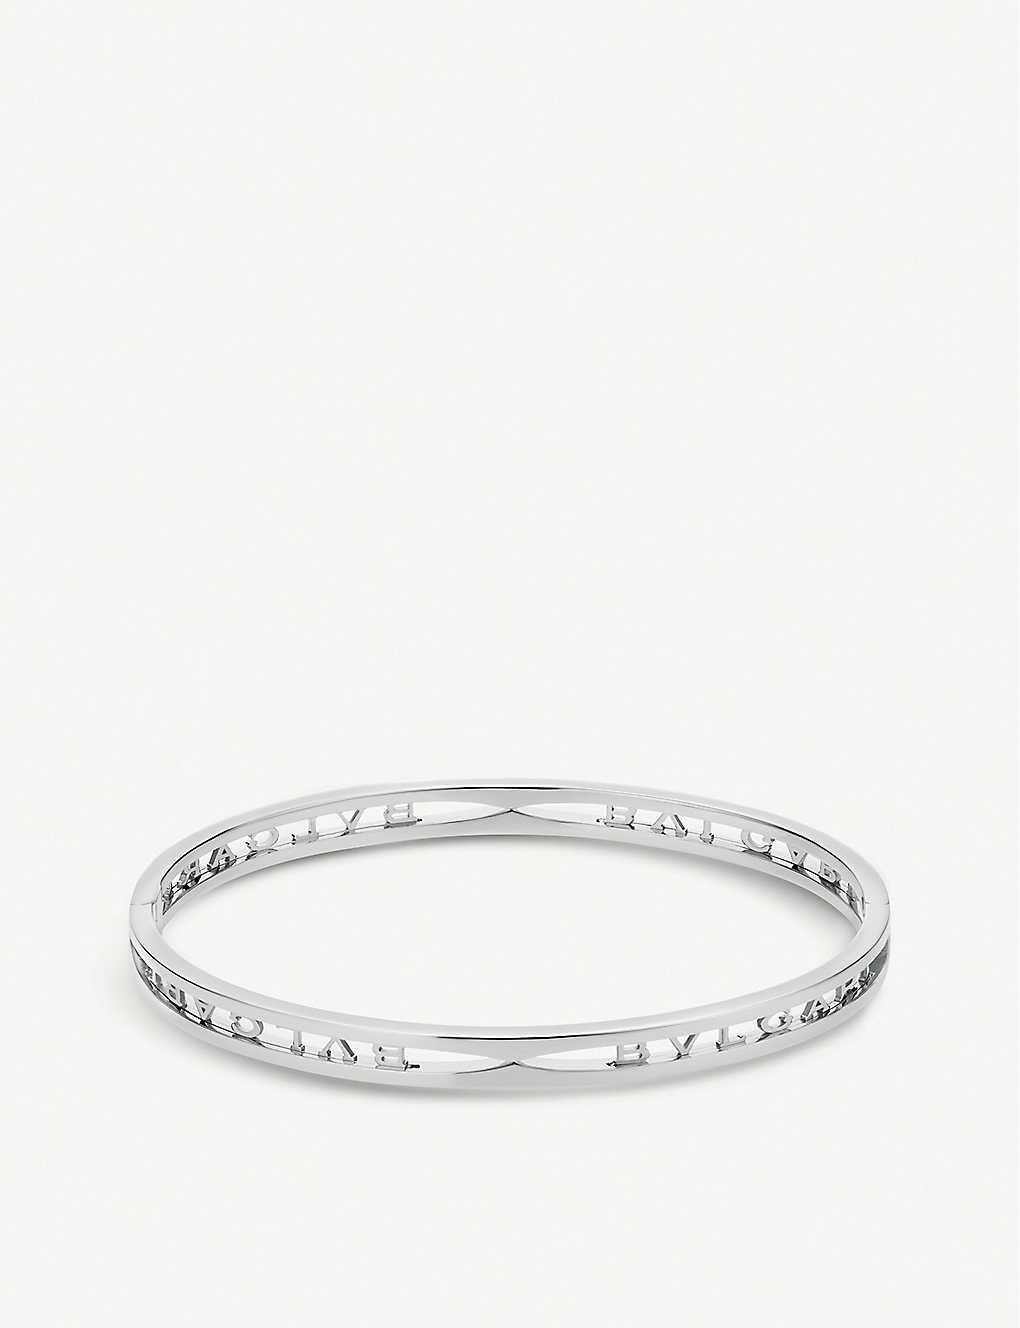 BVLGARI B.zero1 18ct white-gold bracelet